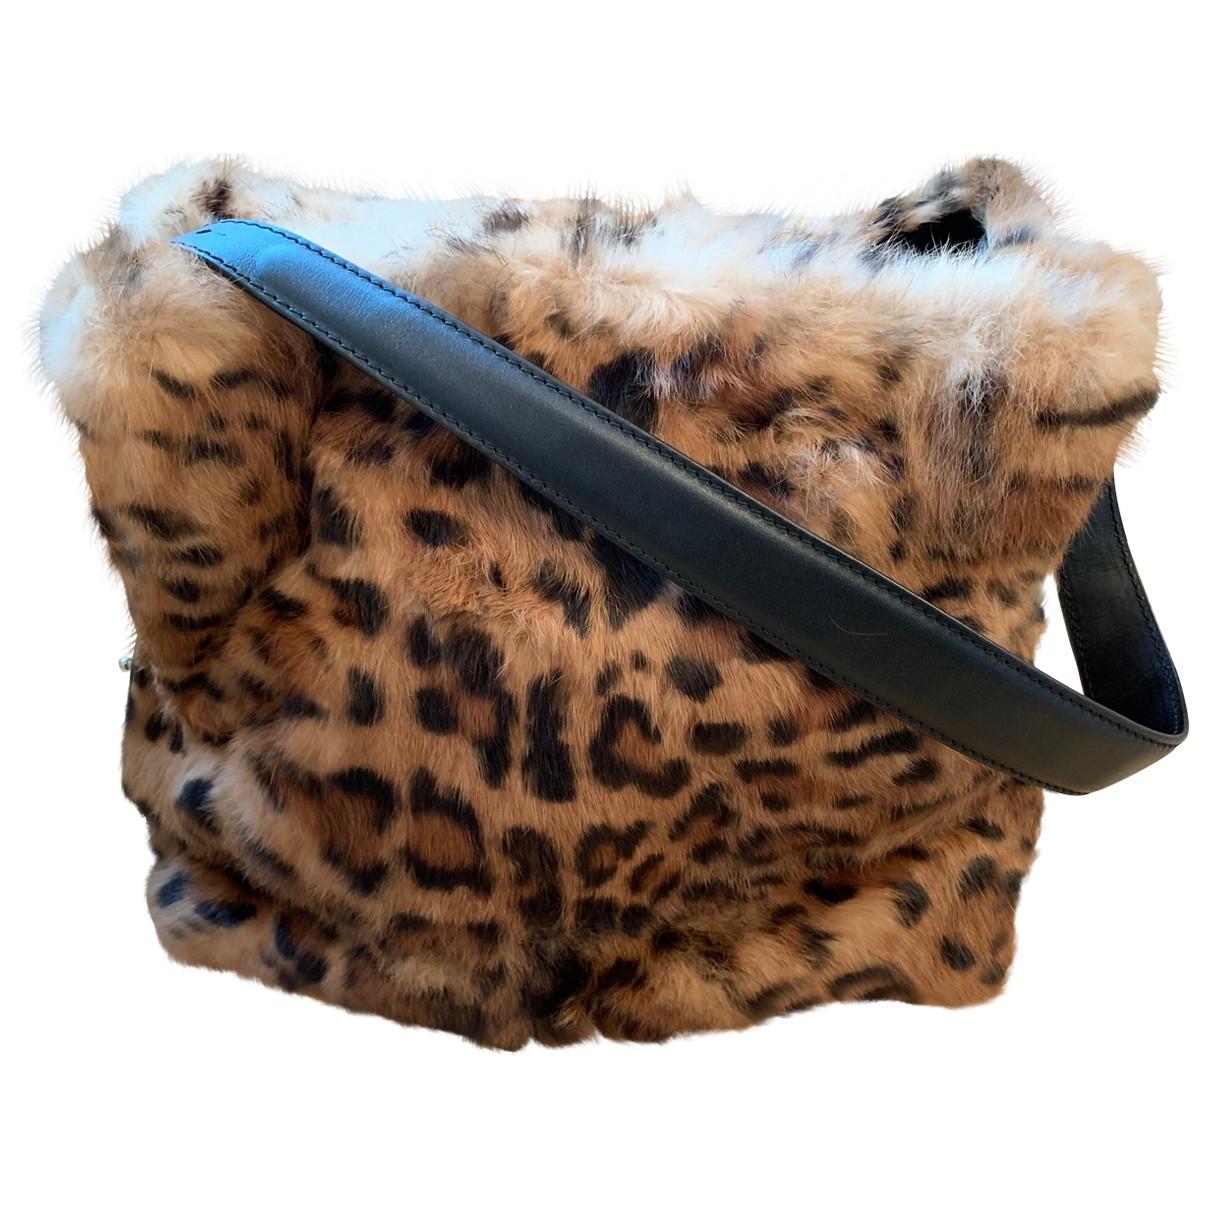 Atelier Tous \N Faux fur handbag for Women \N